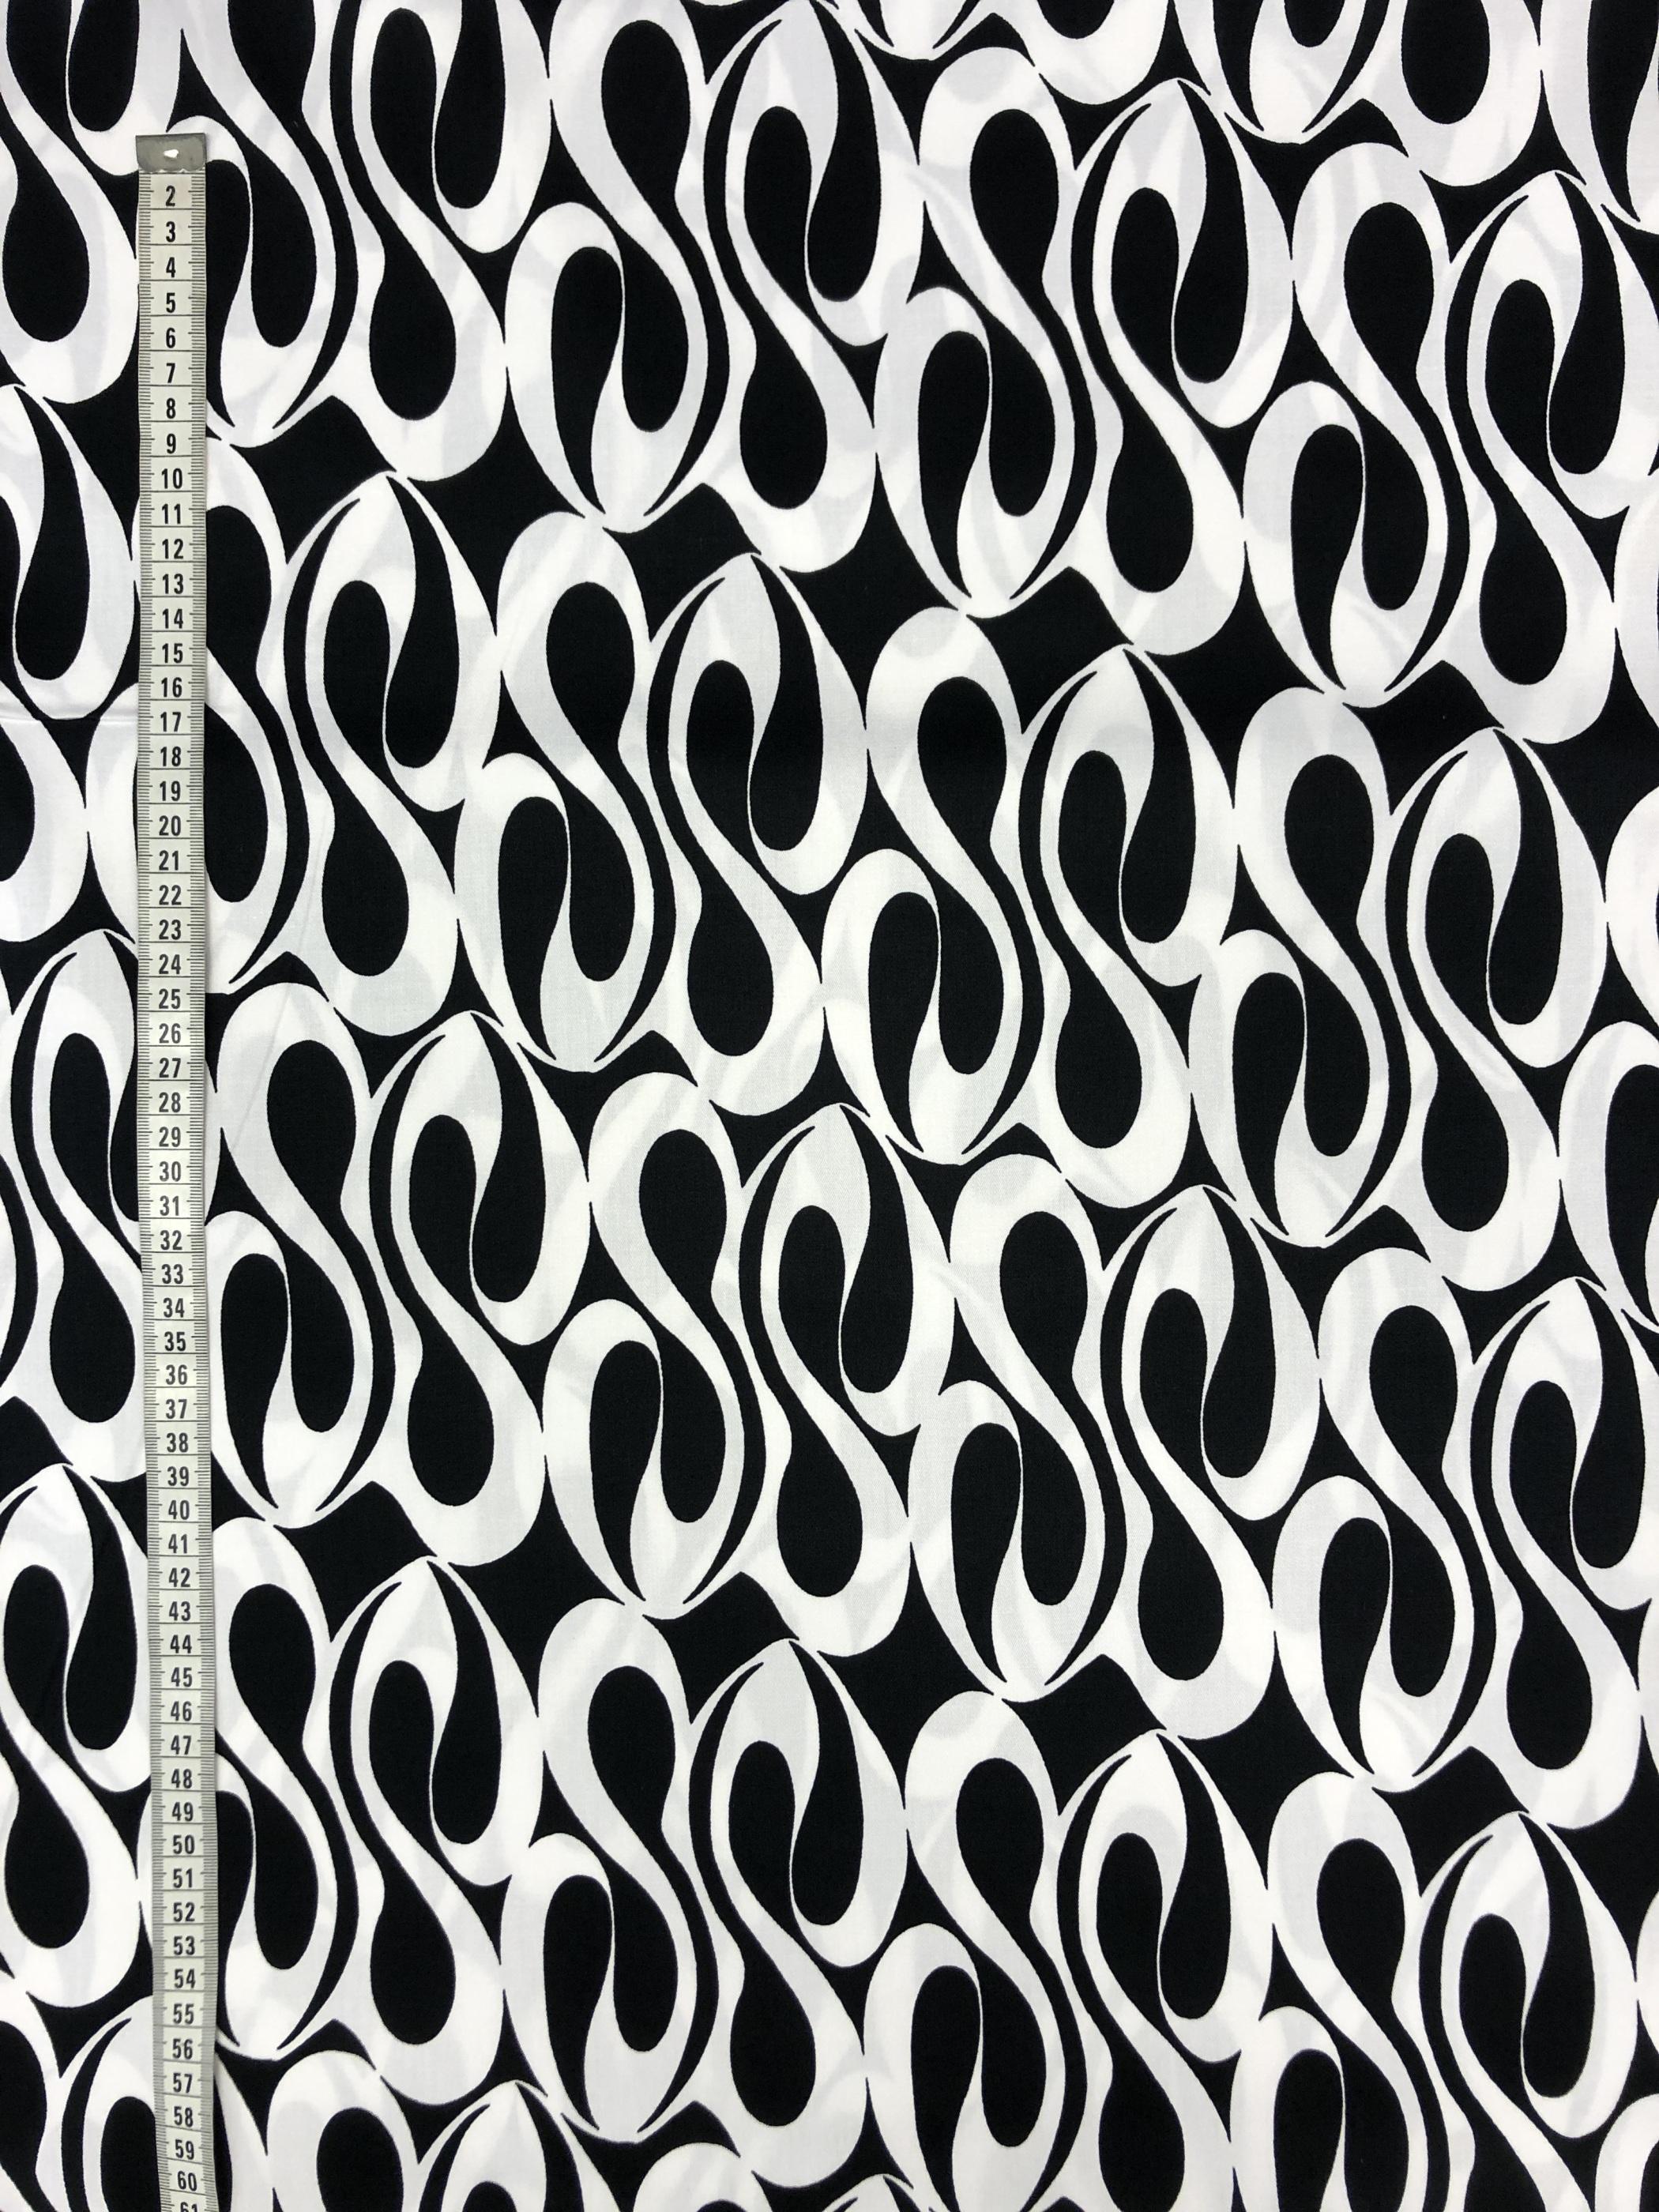 edla bomull modetyg metervara svart vit svartvit tyglust laholm